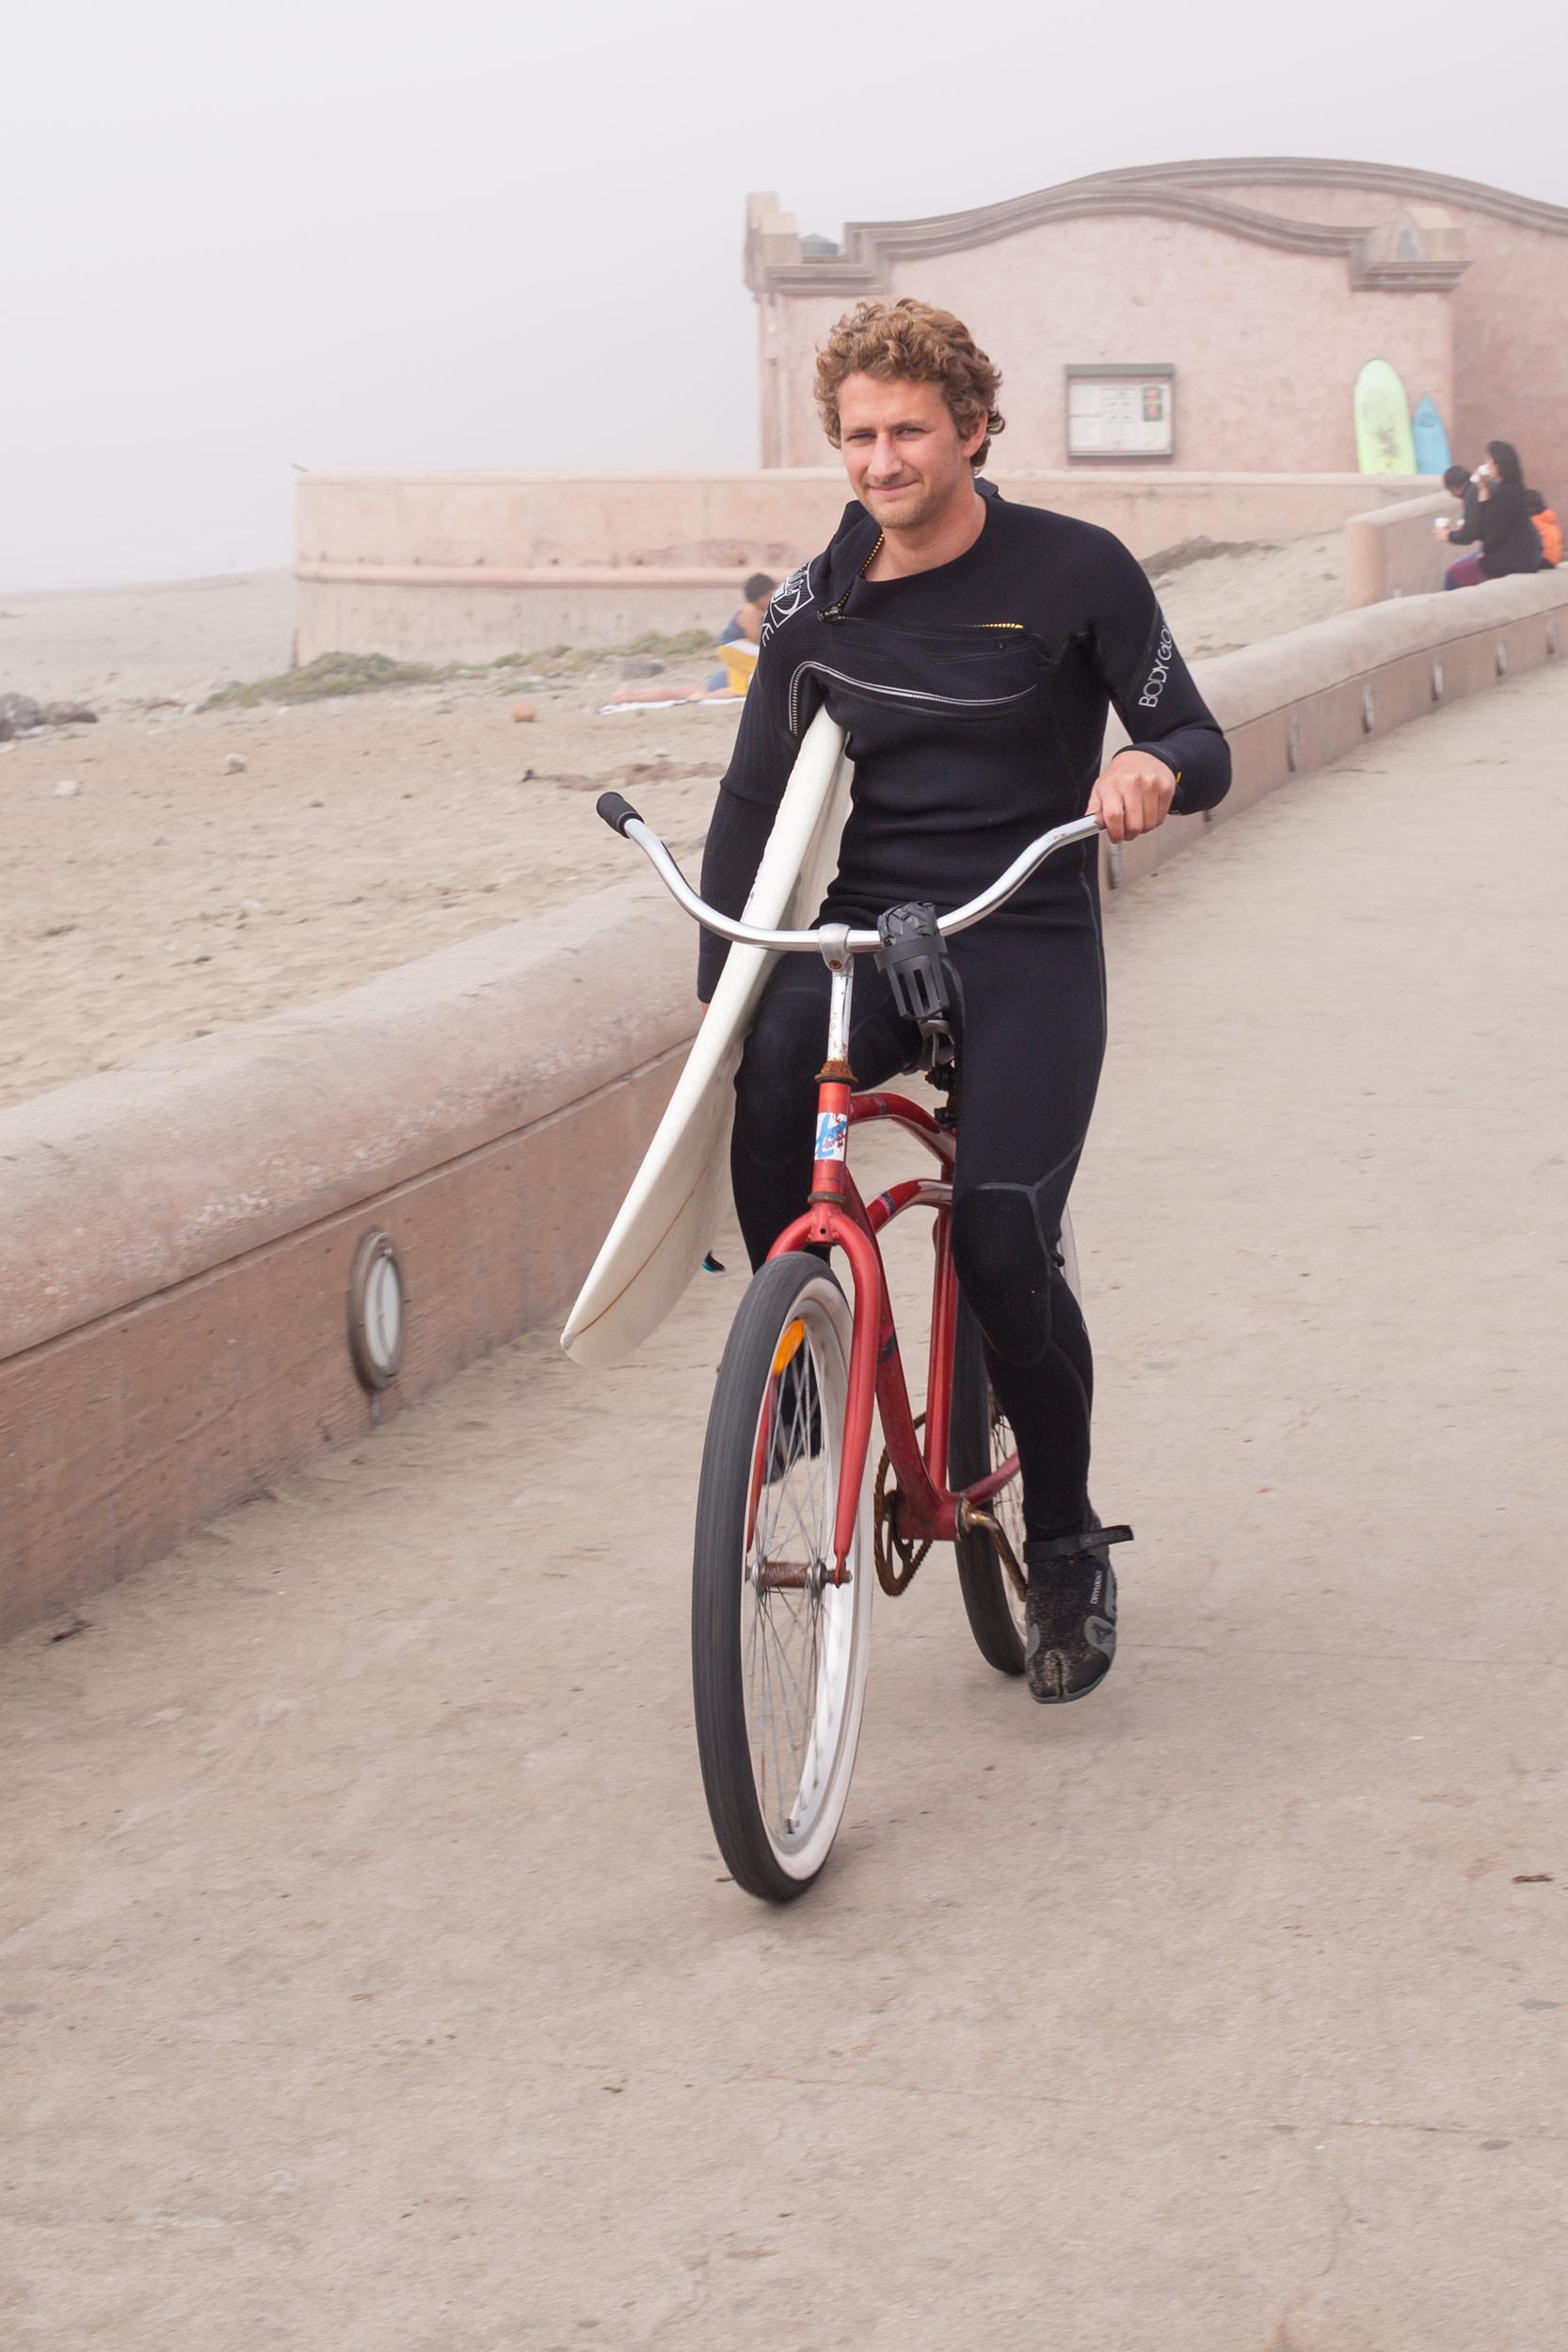 surfer-Pacifica-Lindamar-bike.jpg